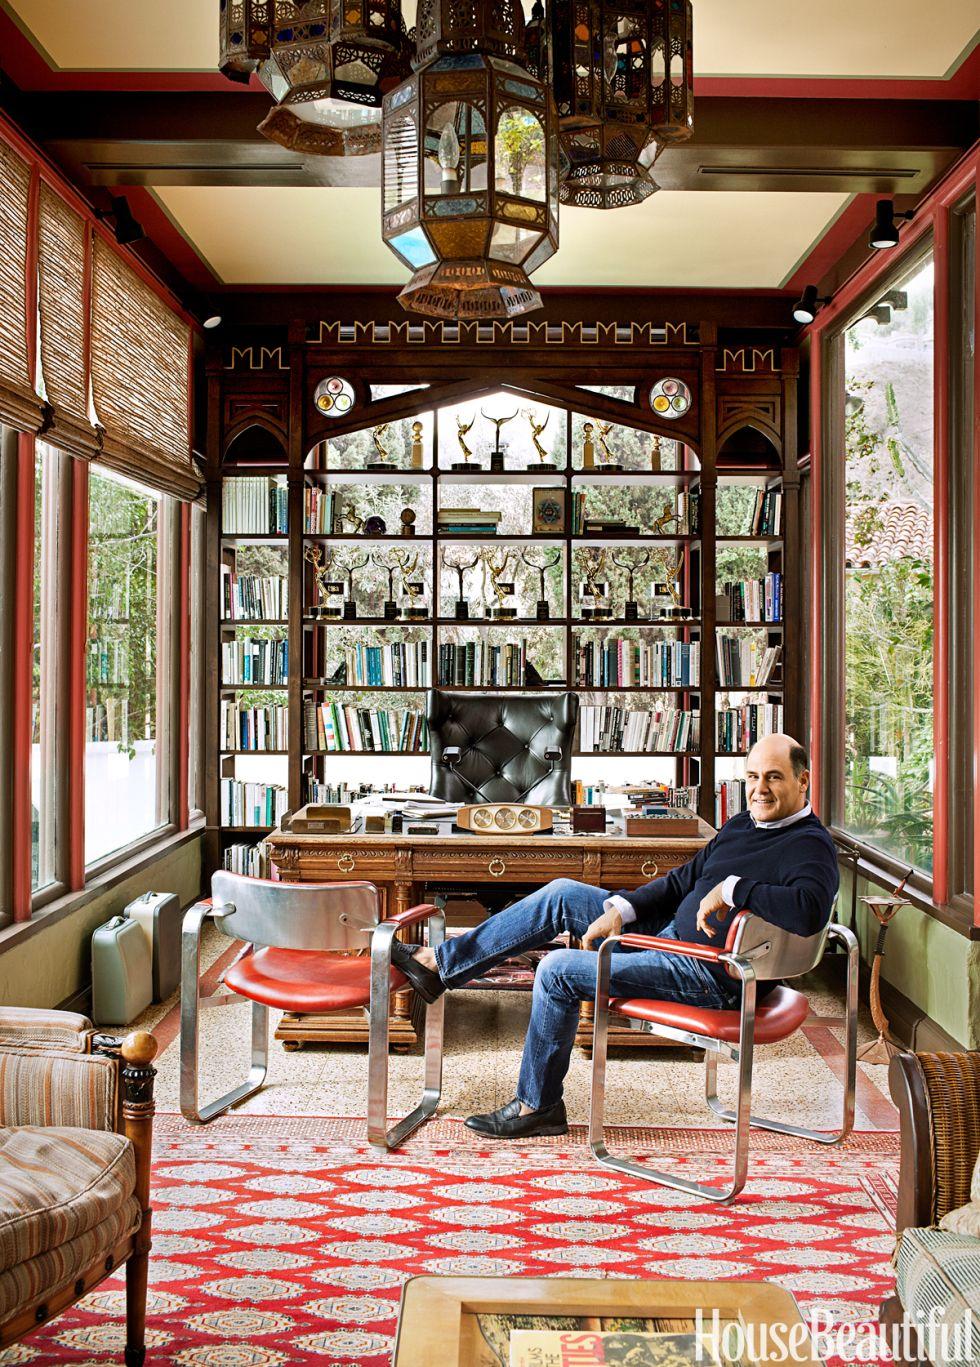 Home hall design-ideen home office design inspiration badezimmer büromöbel couchtisch